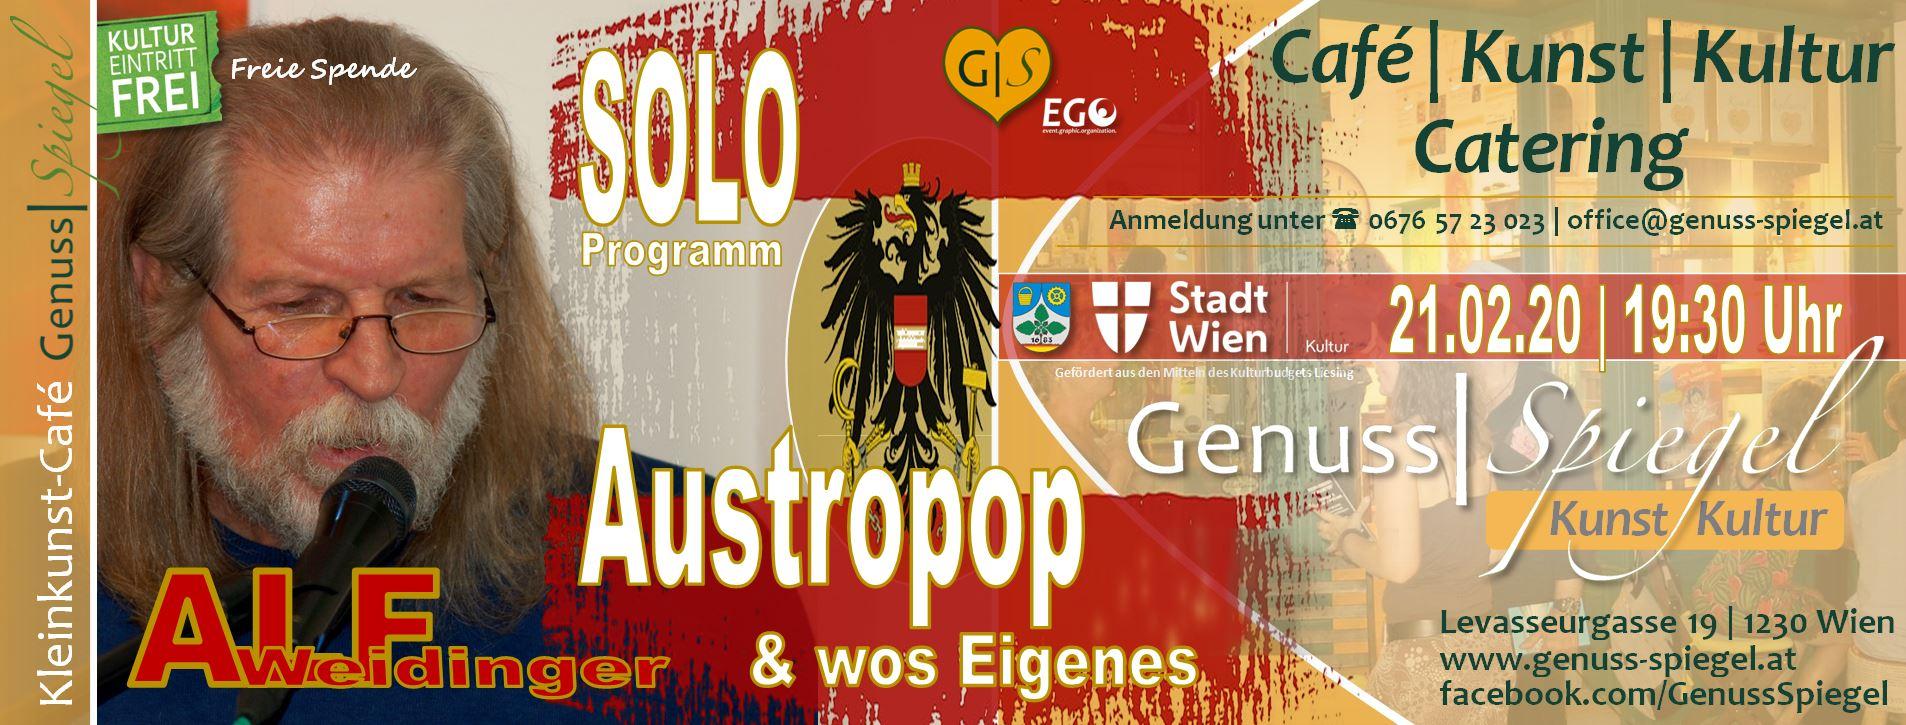 Alf Weidinger´s Austropop & wos Eigenes – Soloprogramm am 21. February 2020 @ Café Genuss-Spiegel.